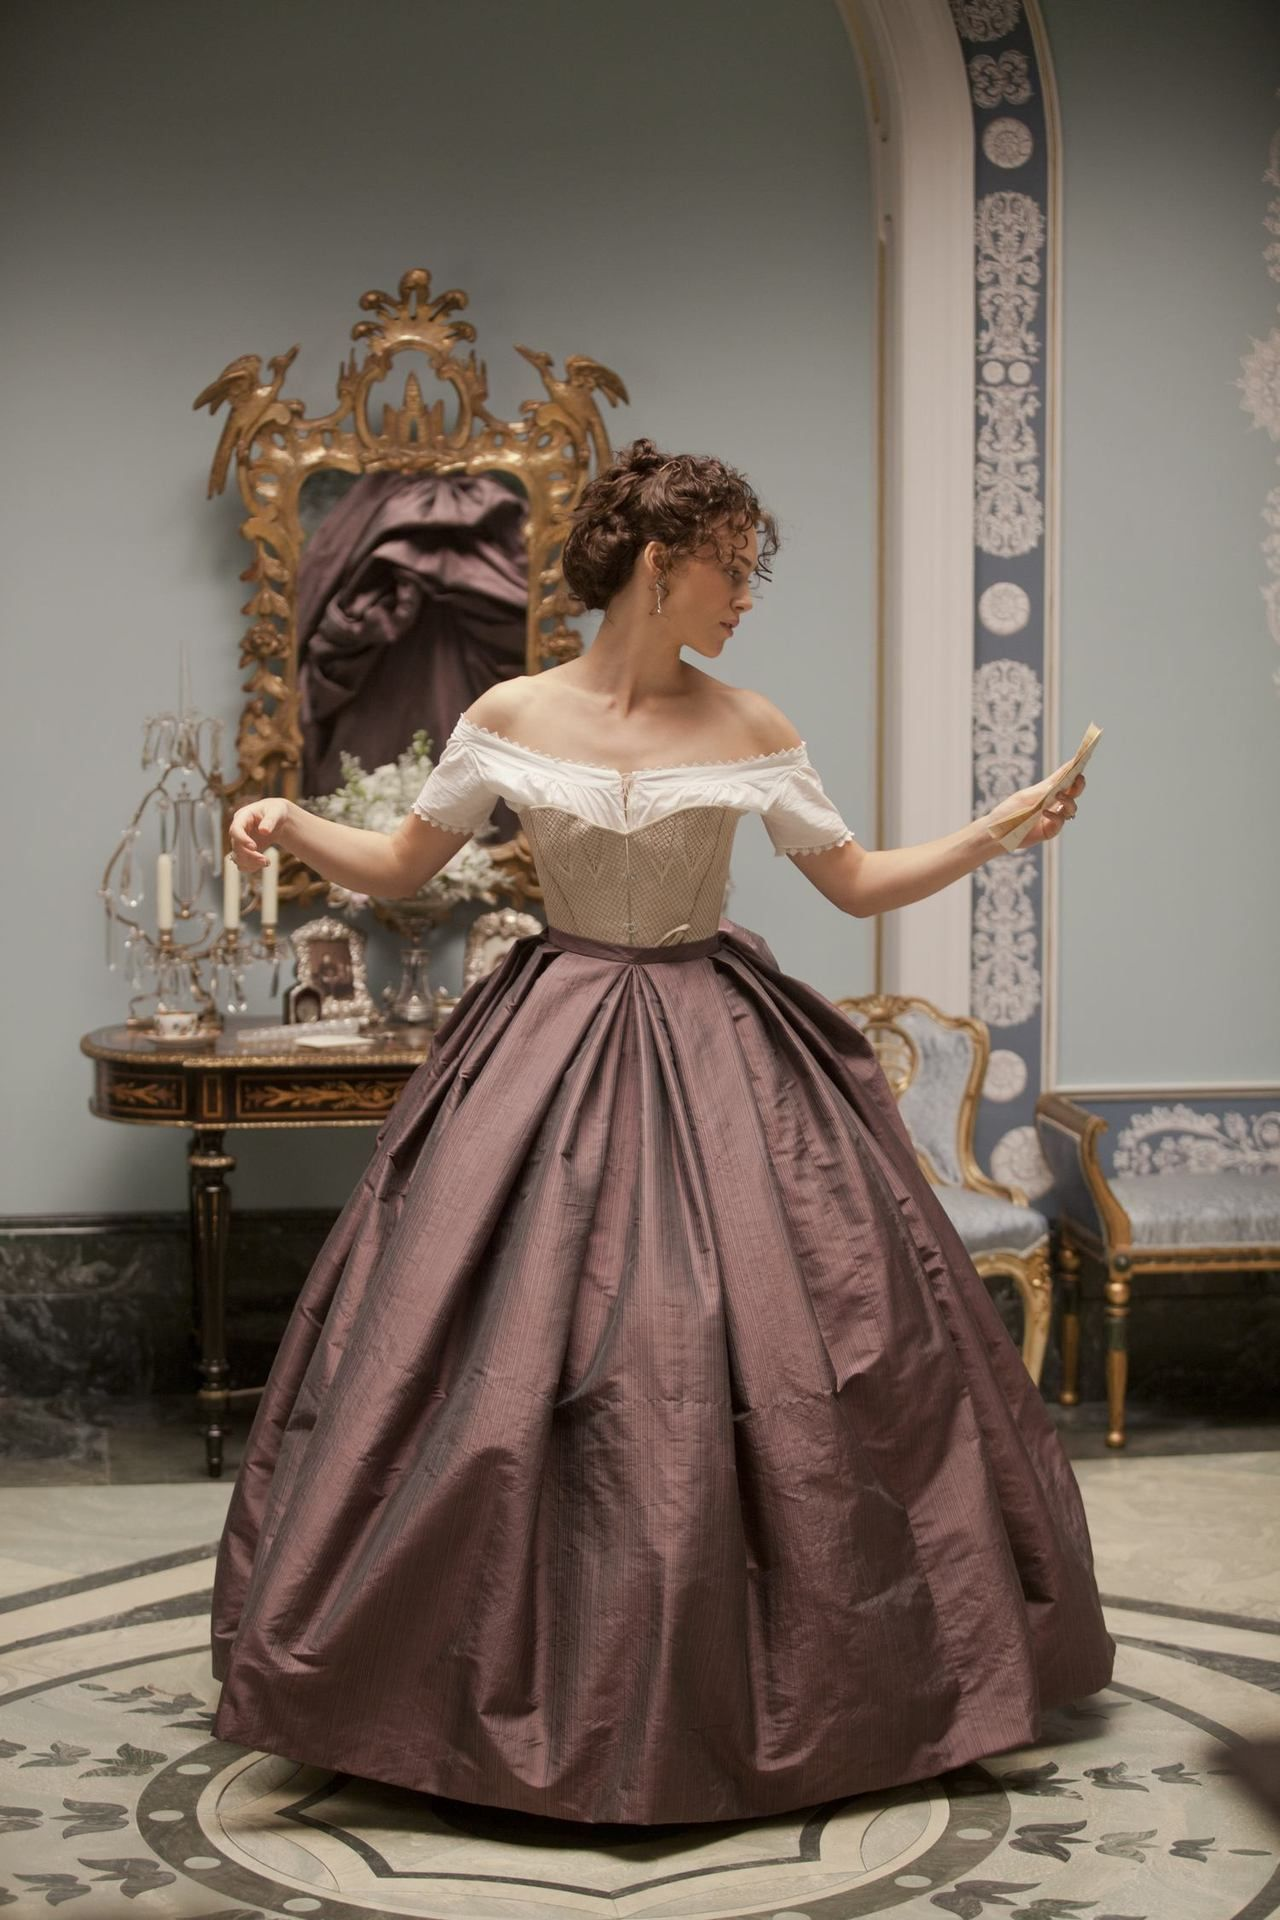 Keira Knightley costume in 'Anna Karenina', 2012. Late ...